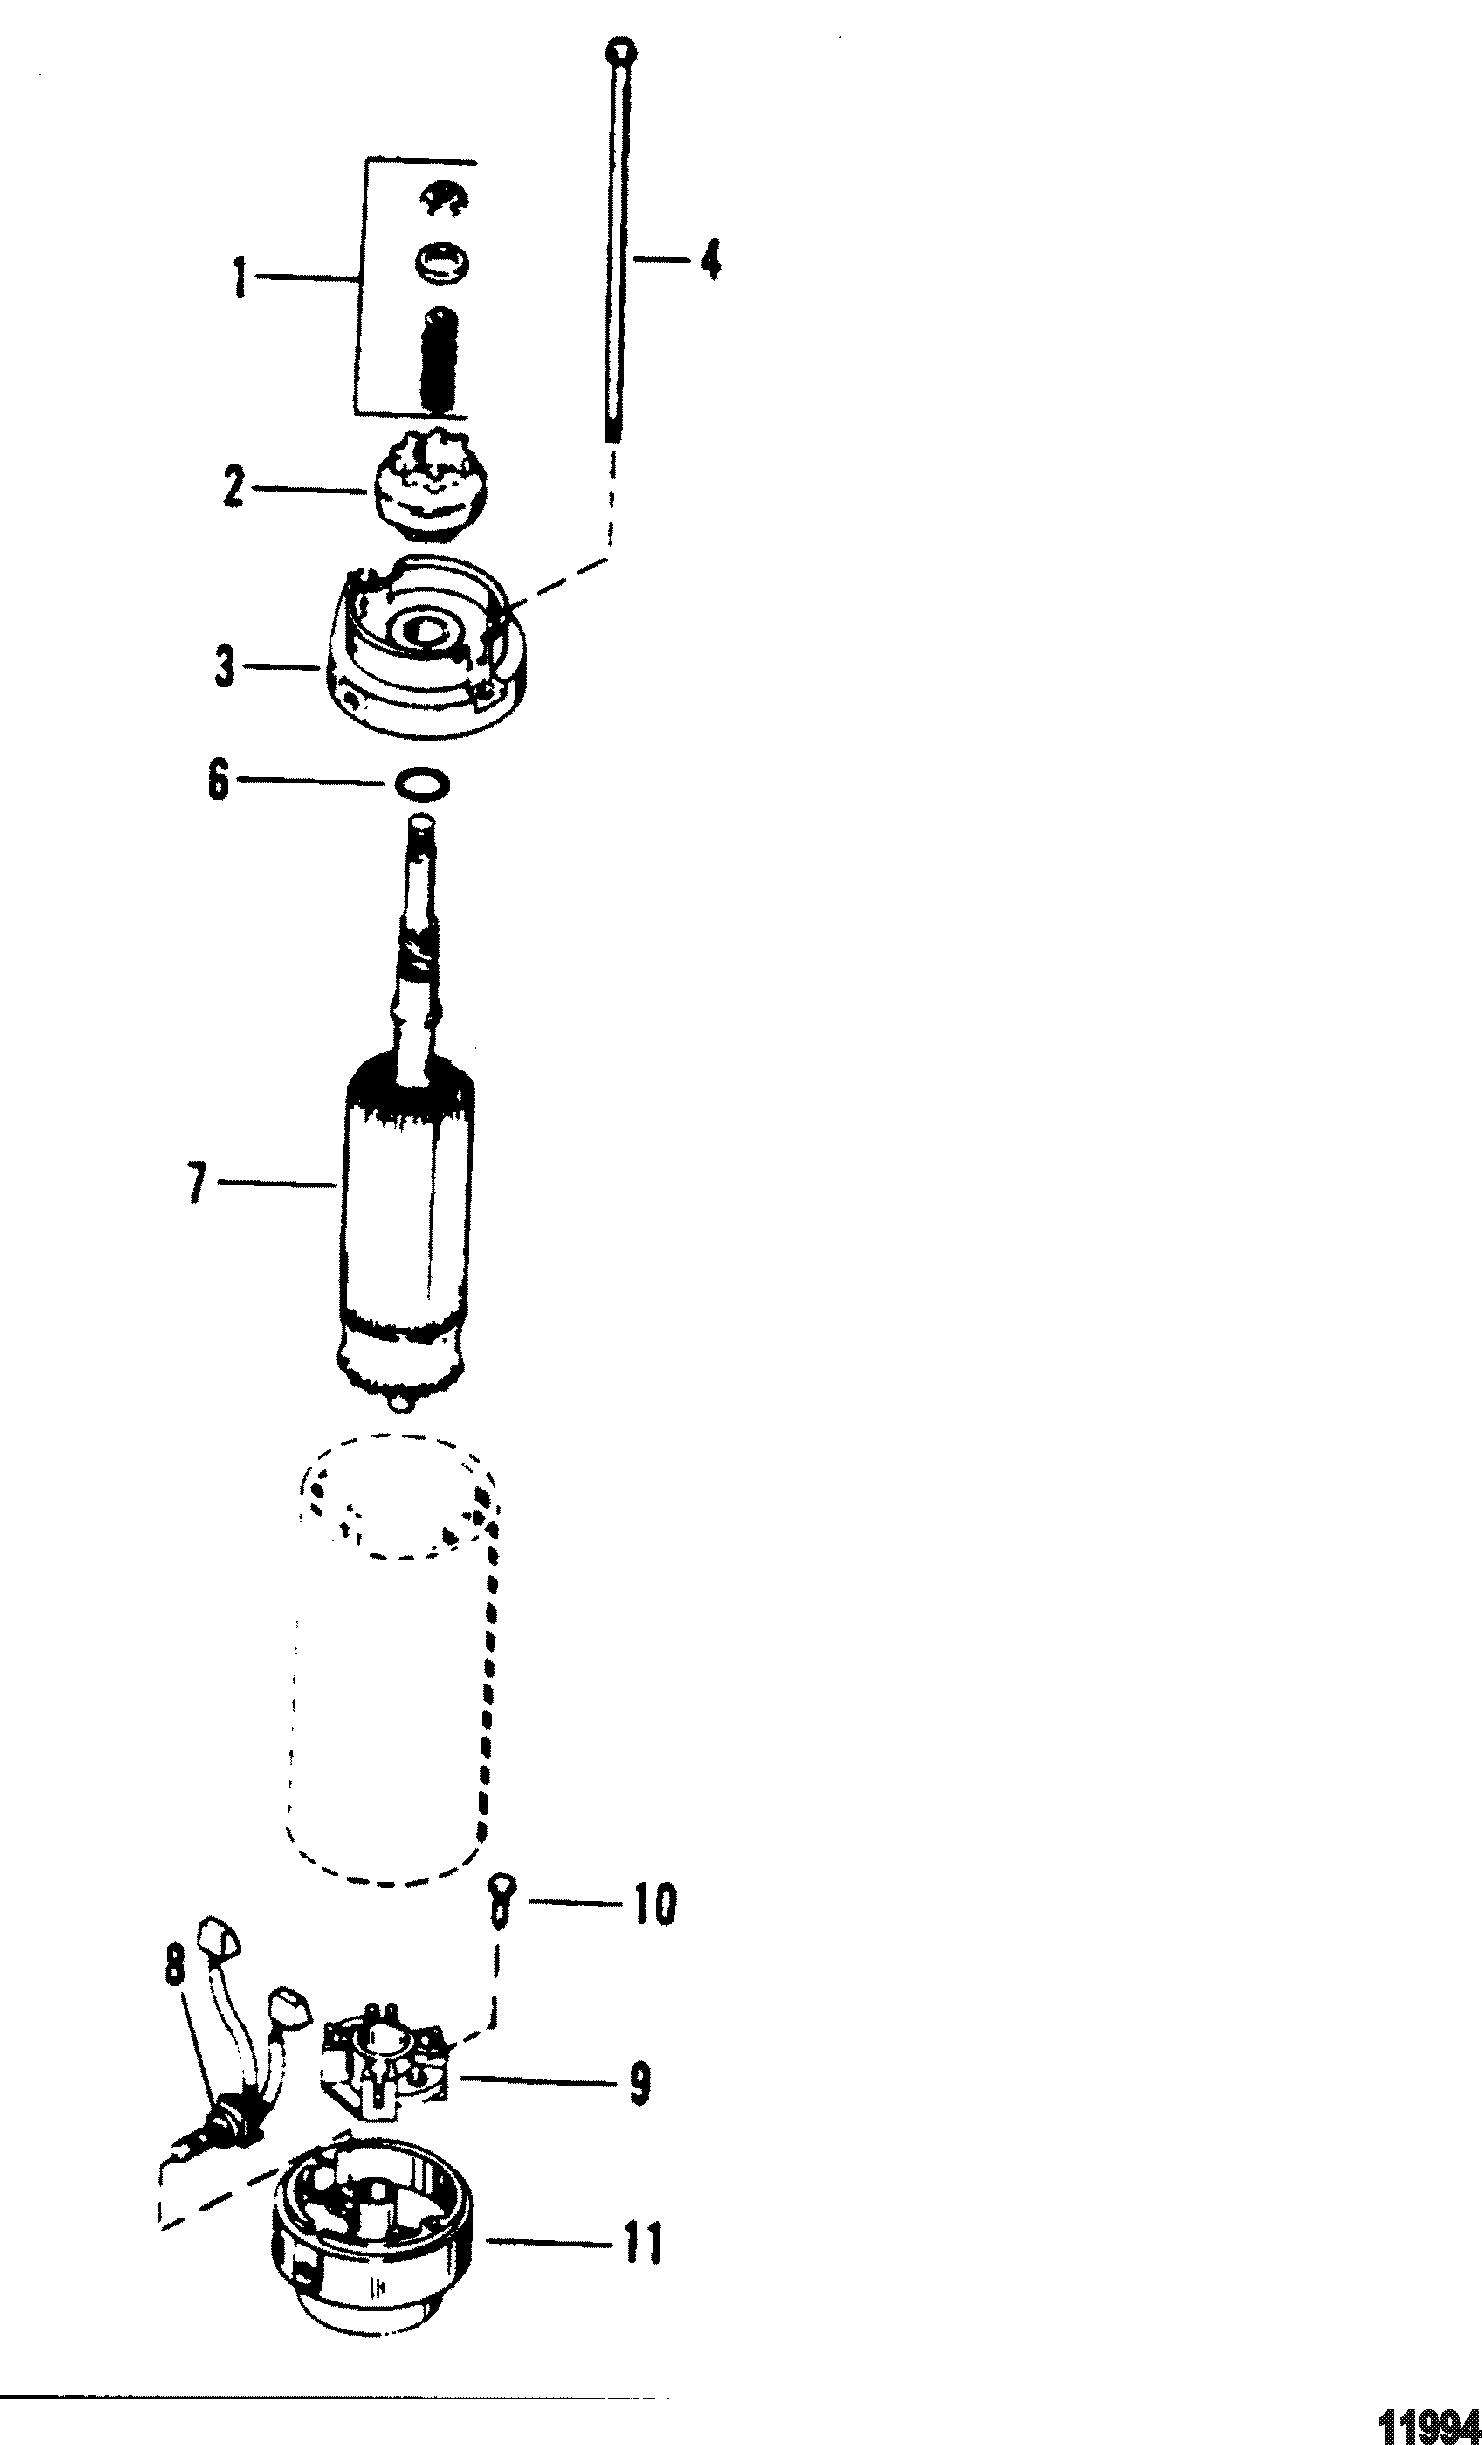 40 hp 4 cyl mariner wiring diagram  40  get free image